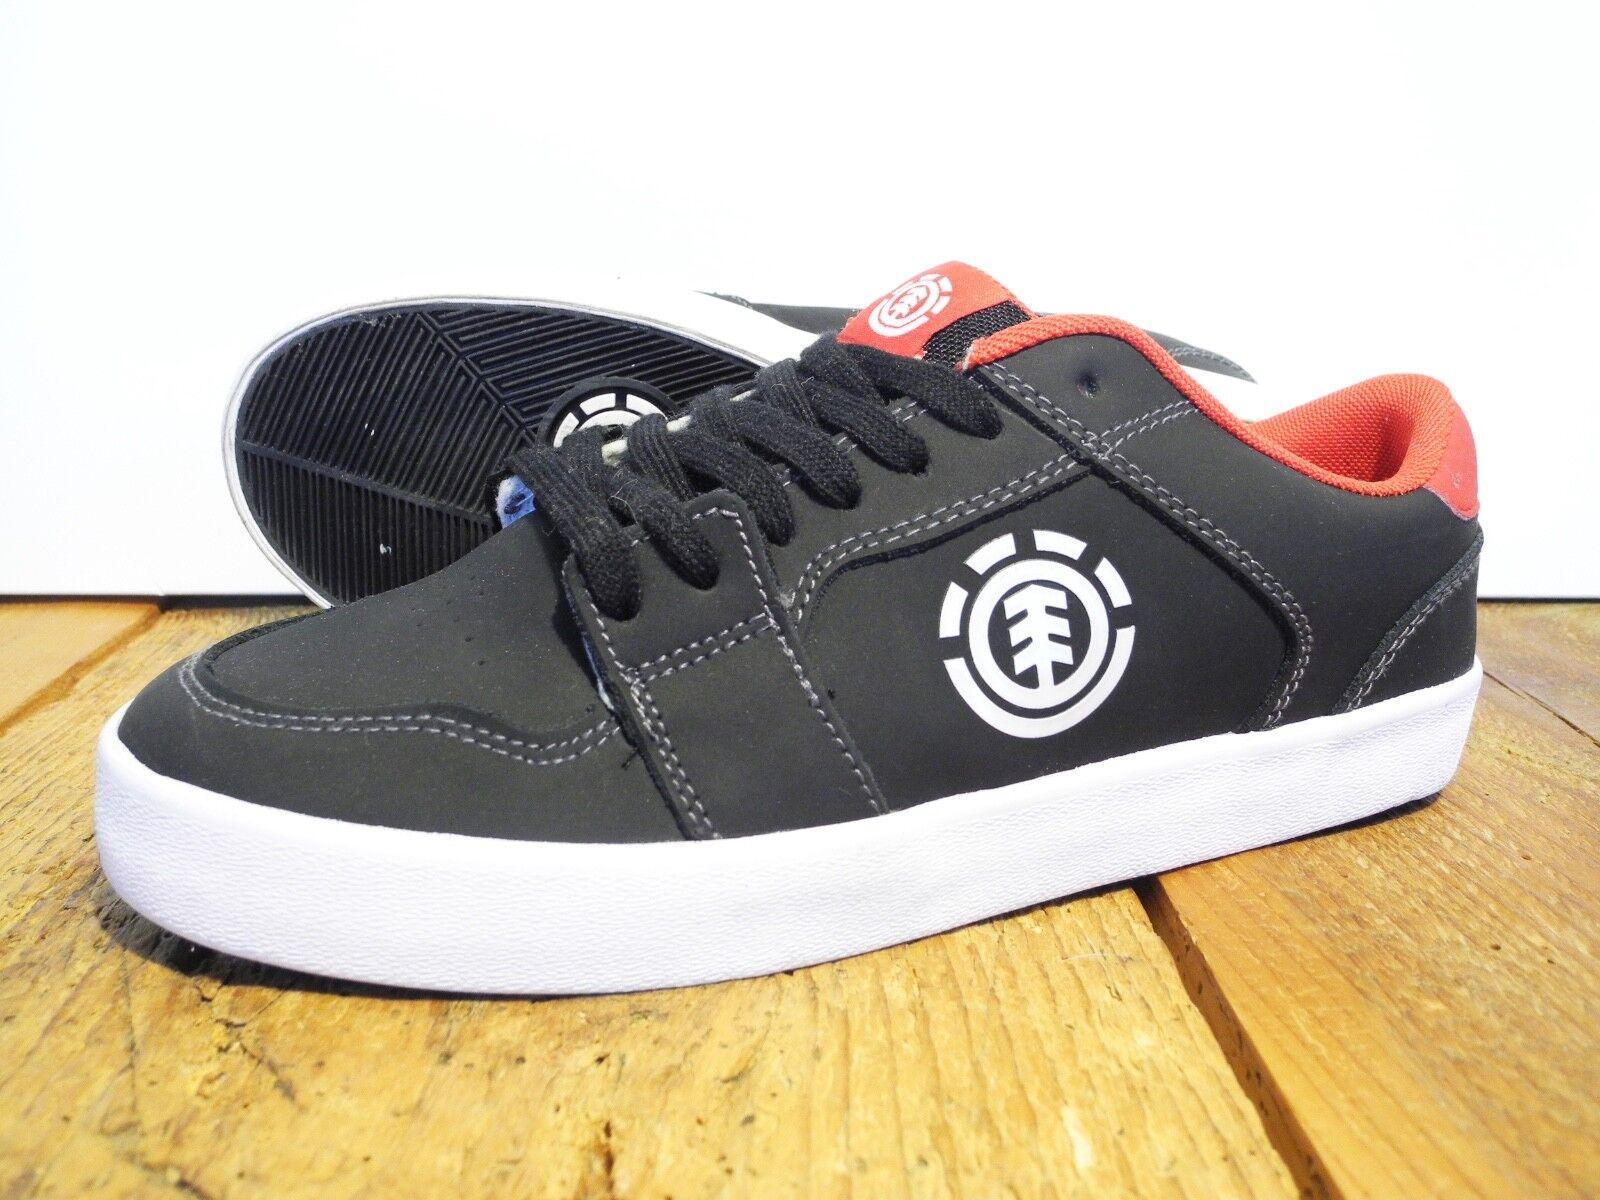 ELEMENT HEATLY SHOE NEU BLACK-RED GR  US 8 EUR 40,5 ELEMENT FOOTWEAR